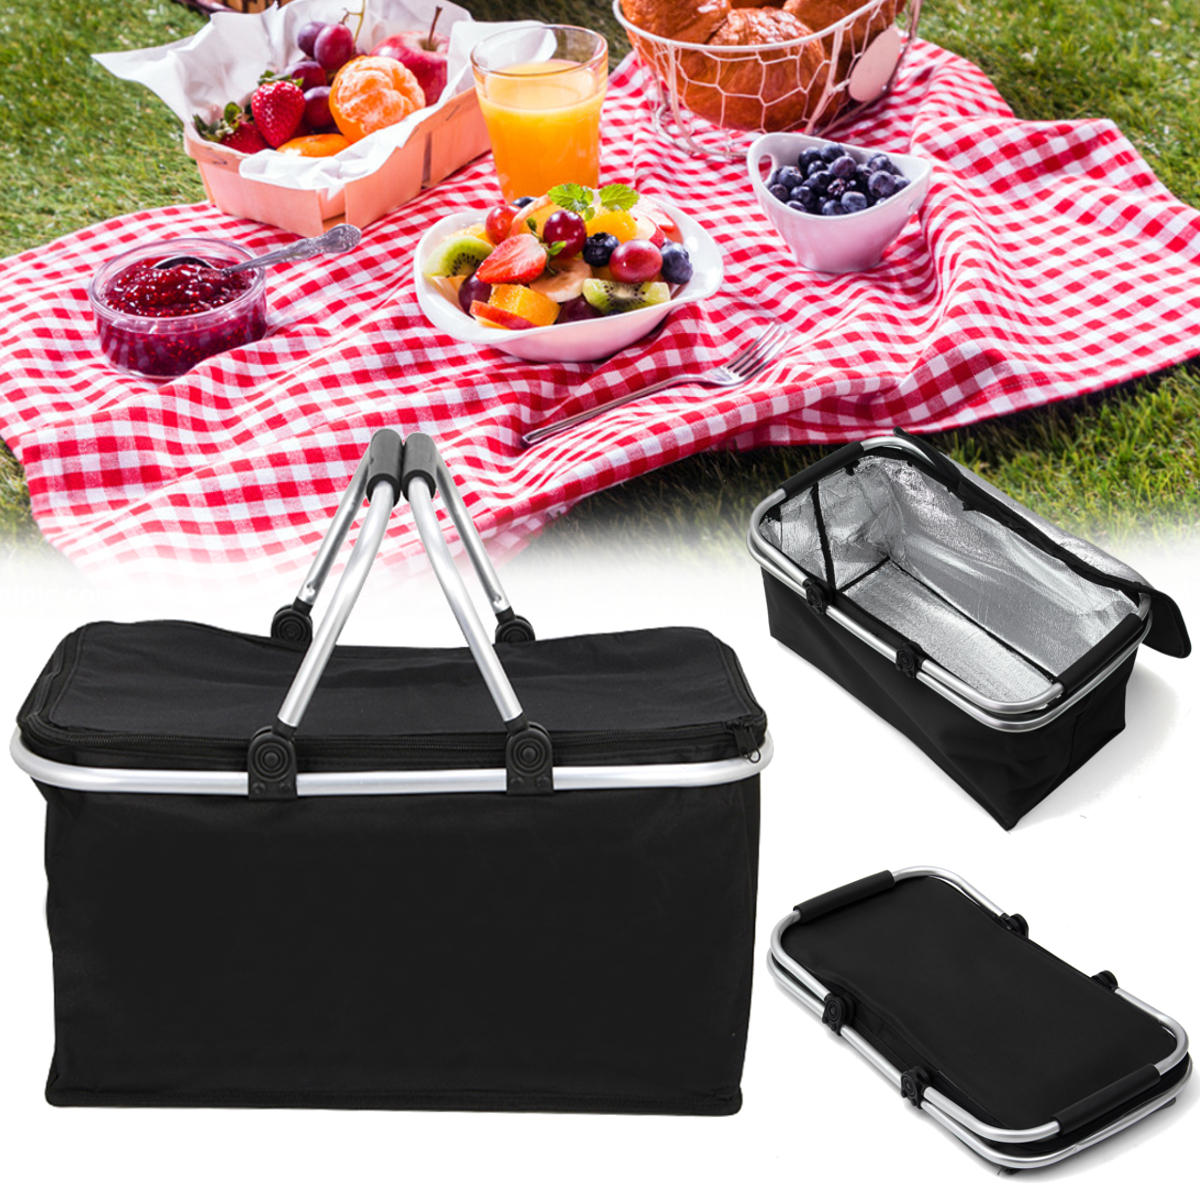 IPRee® LG1 30L Folding Picnic Storage Baskets Insulated Storage Cooler Hamper Waterproof Camping Travel Lunch Bag